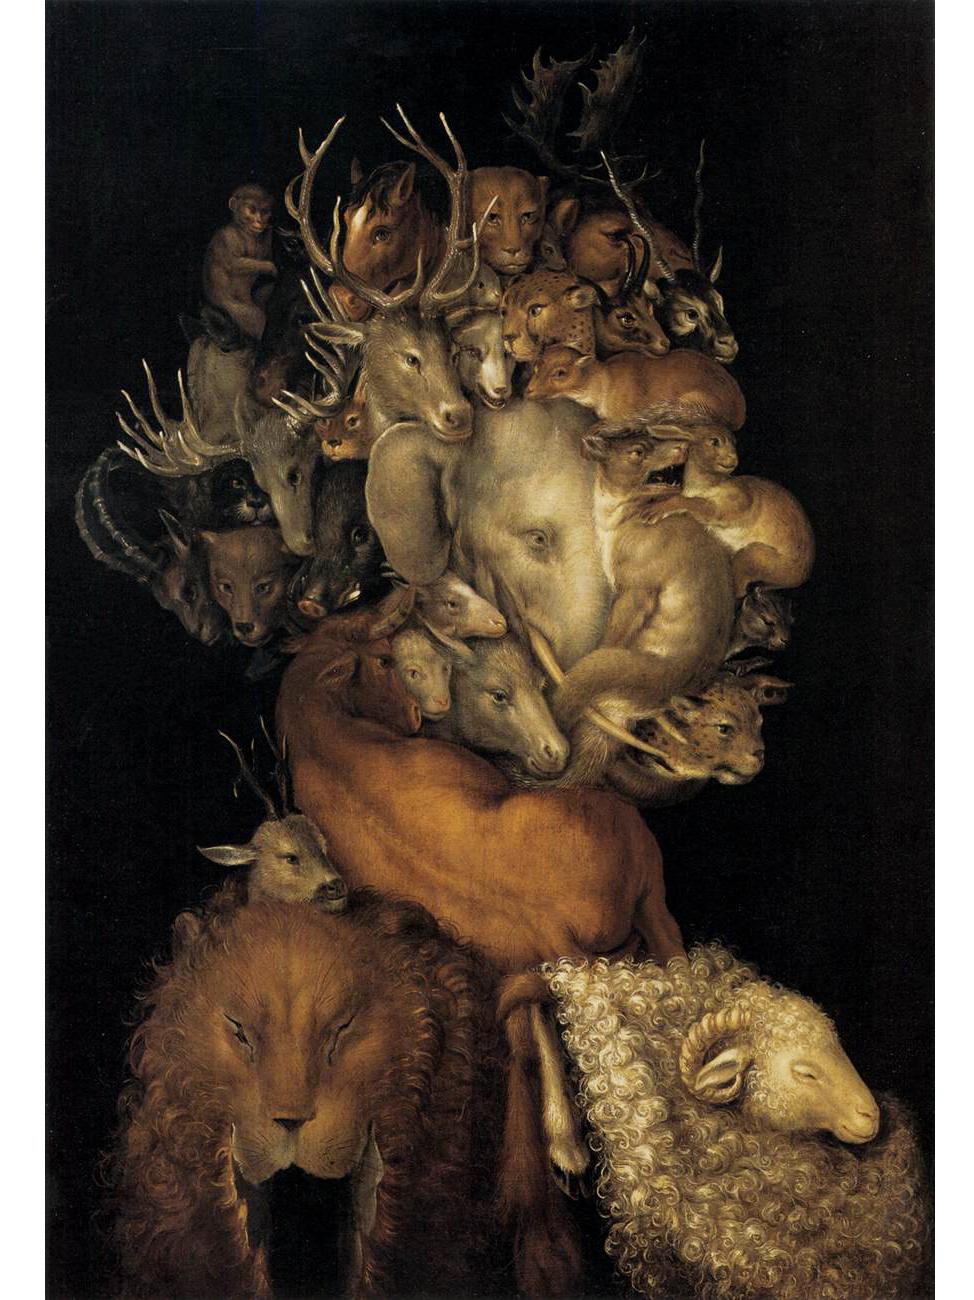 Giuseppe Arcimboldo (Milano 1526 - 1593) I quattro elementi, Terra